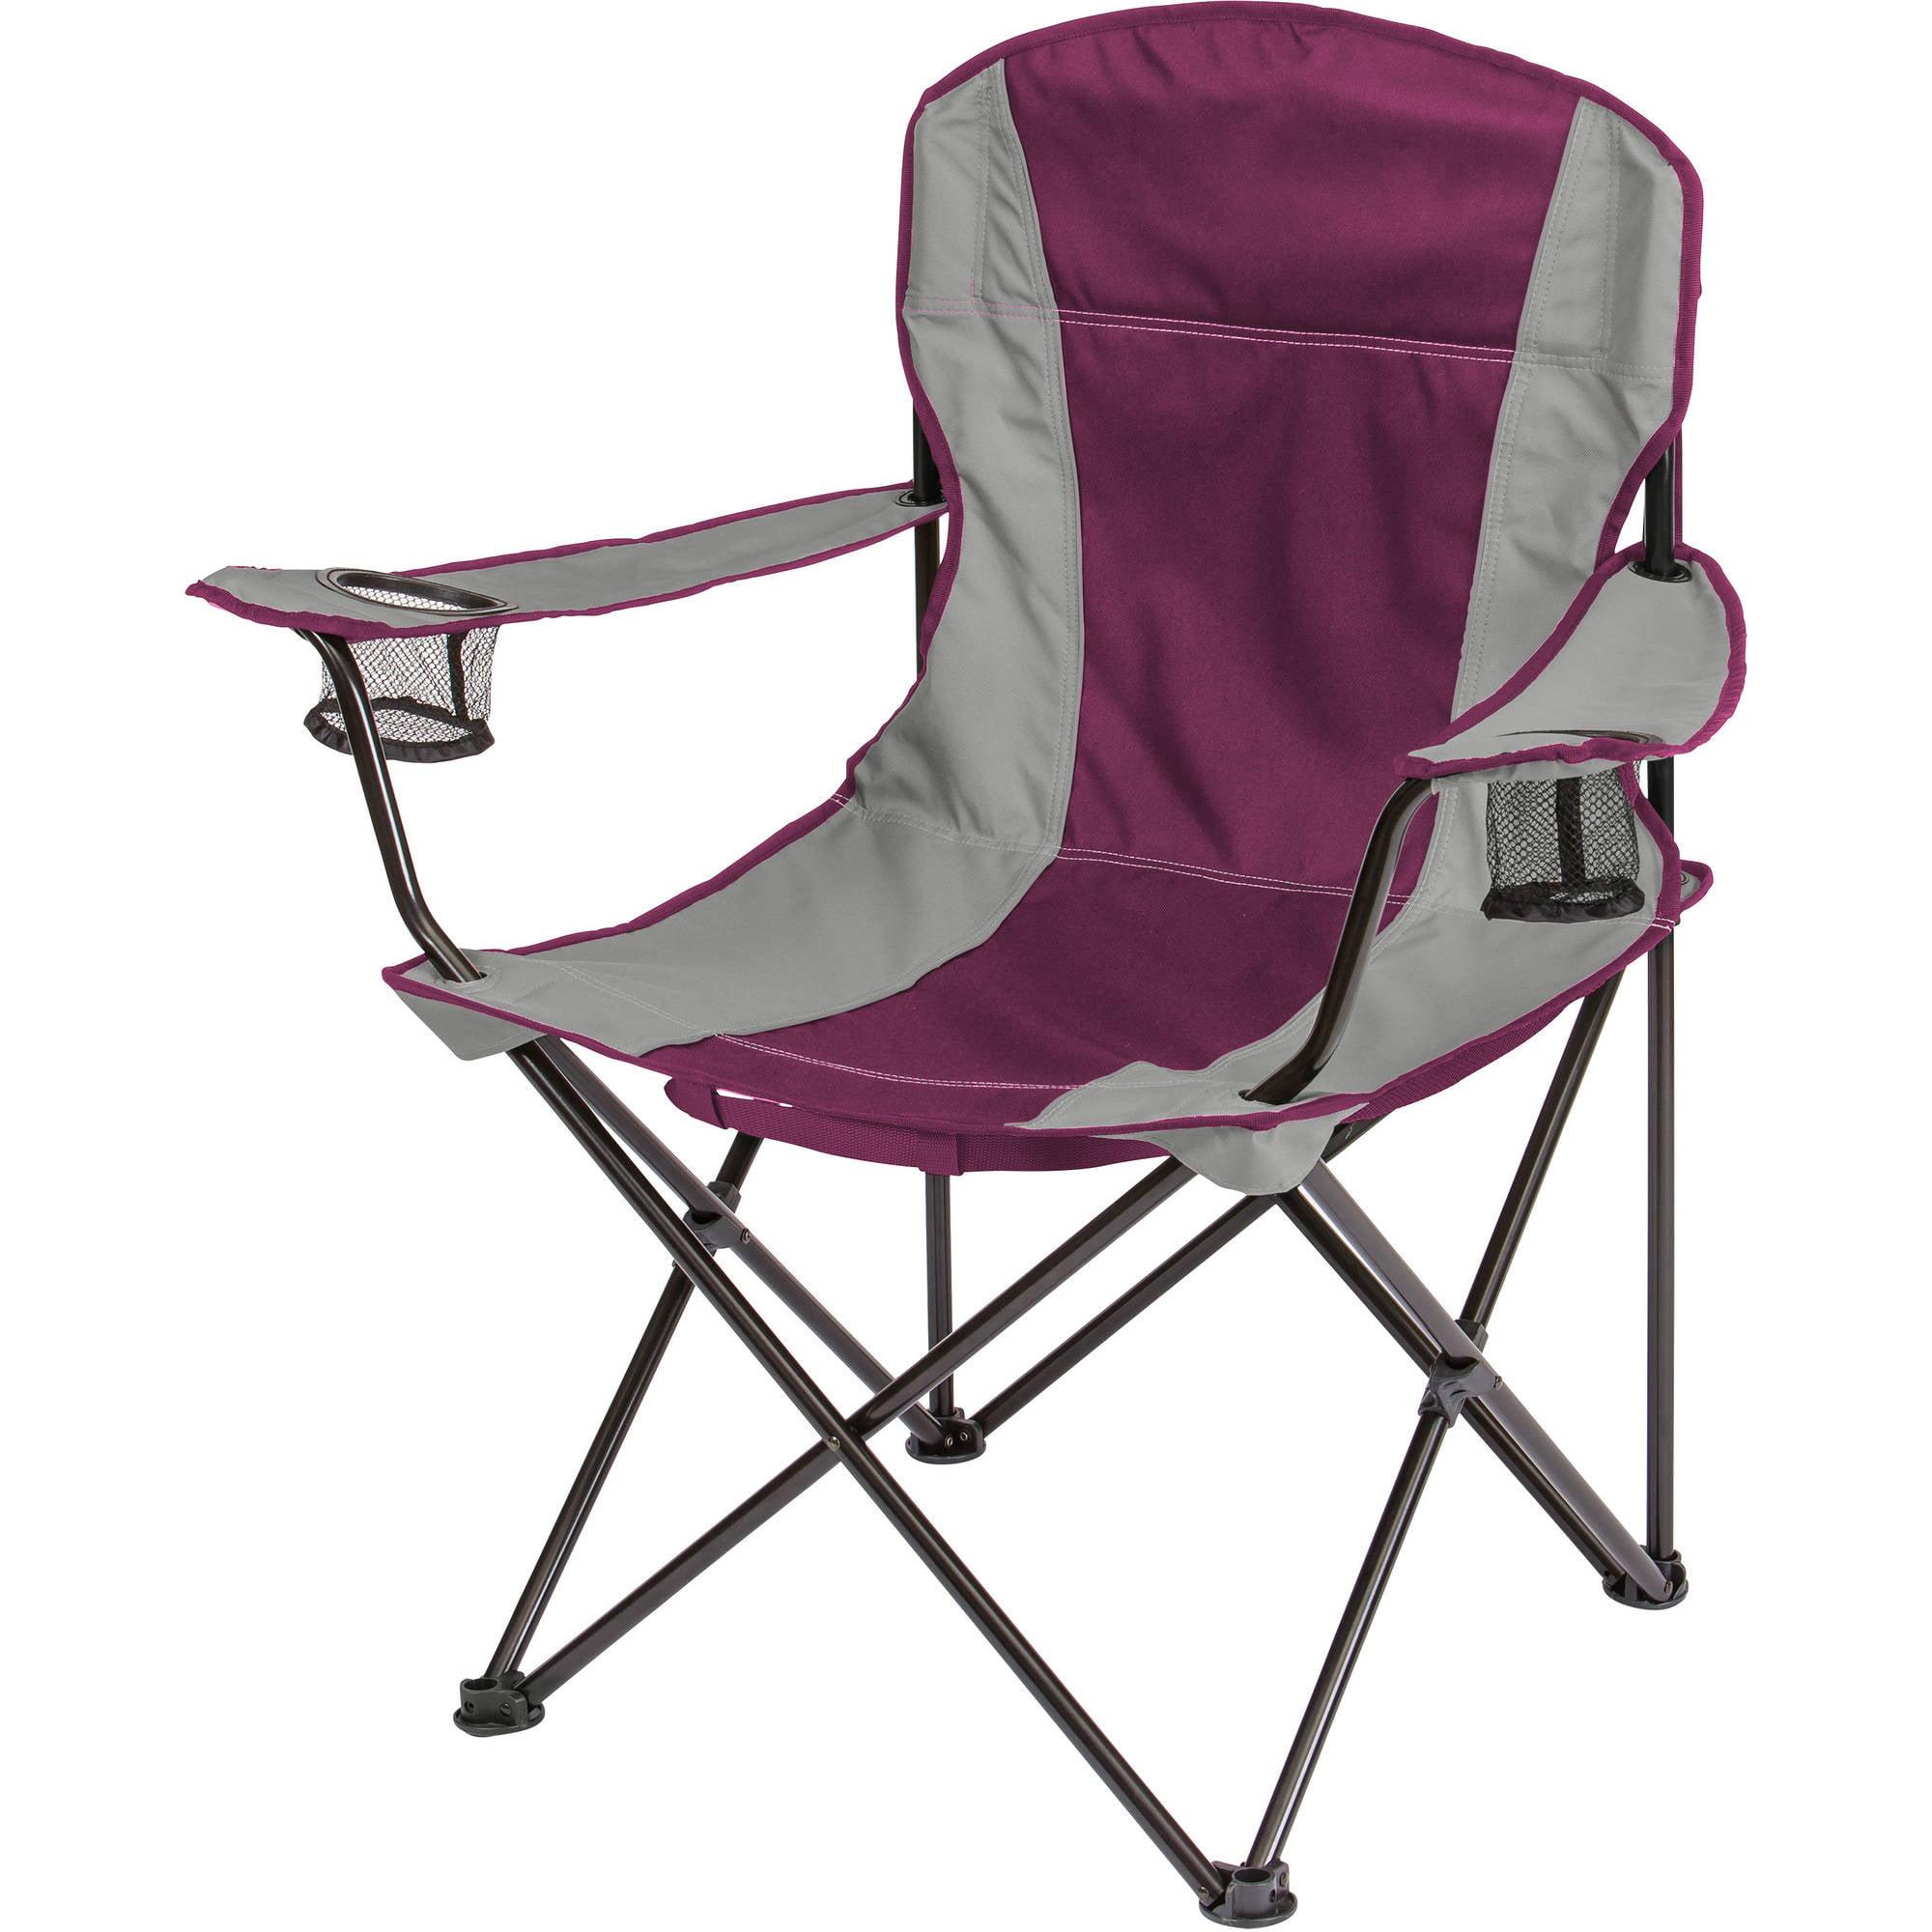 Ozark Trail Oversized Quad Chair